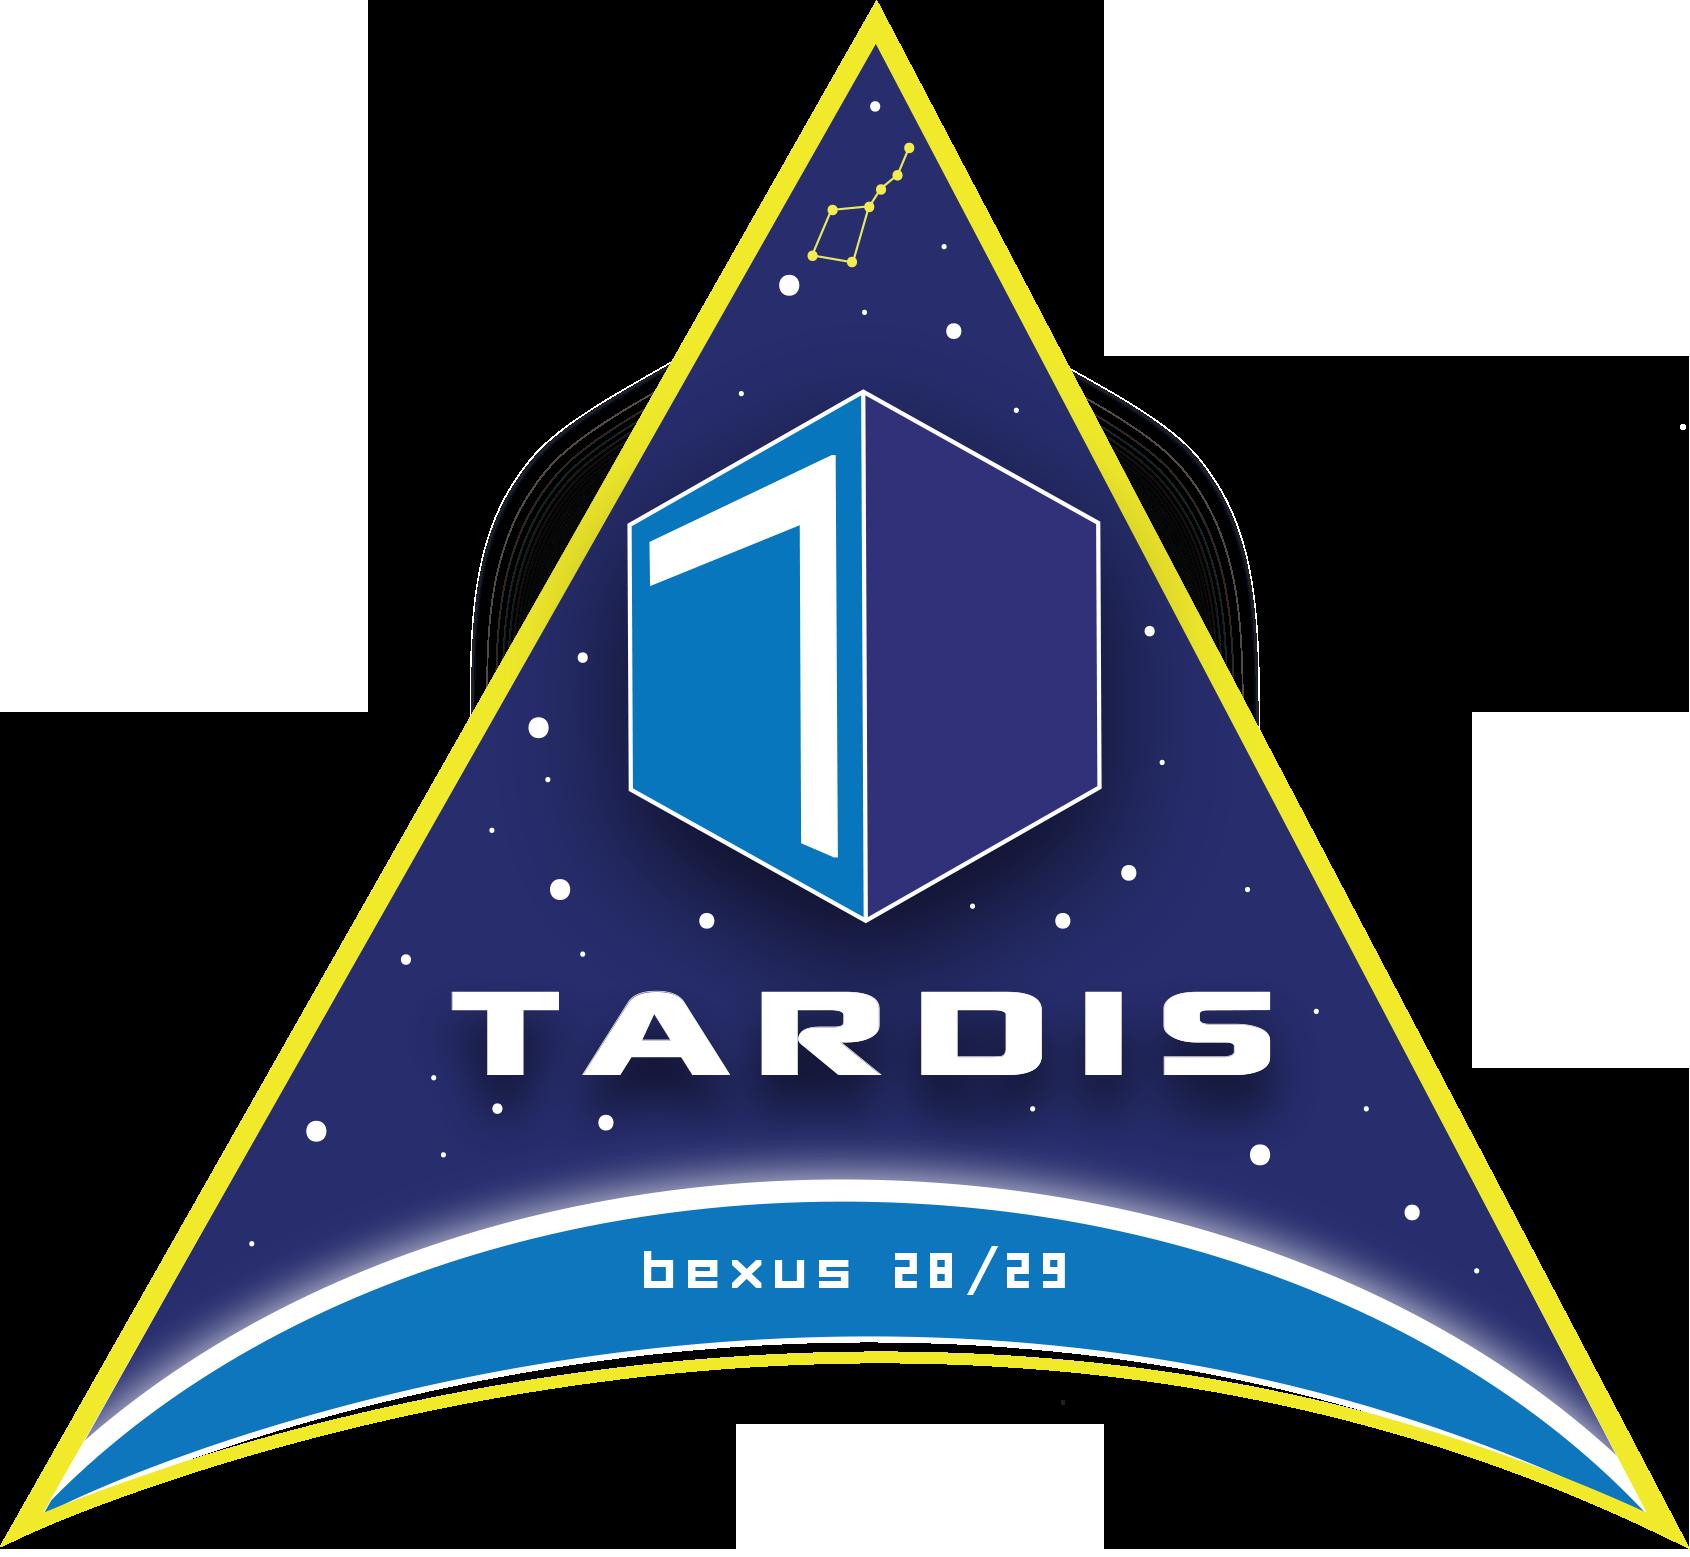 Progetto TARDIS